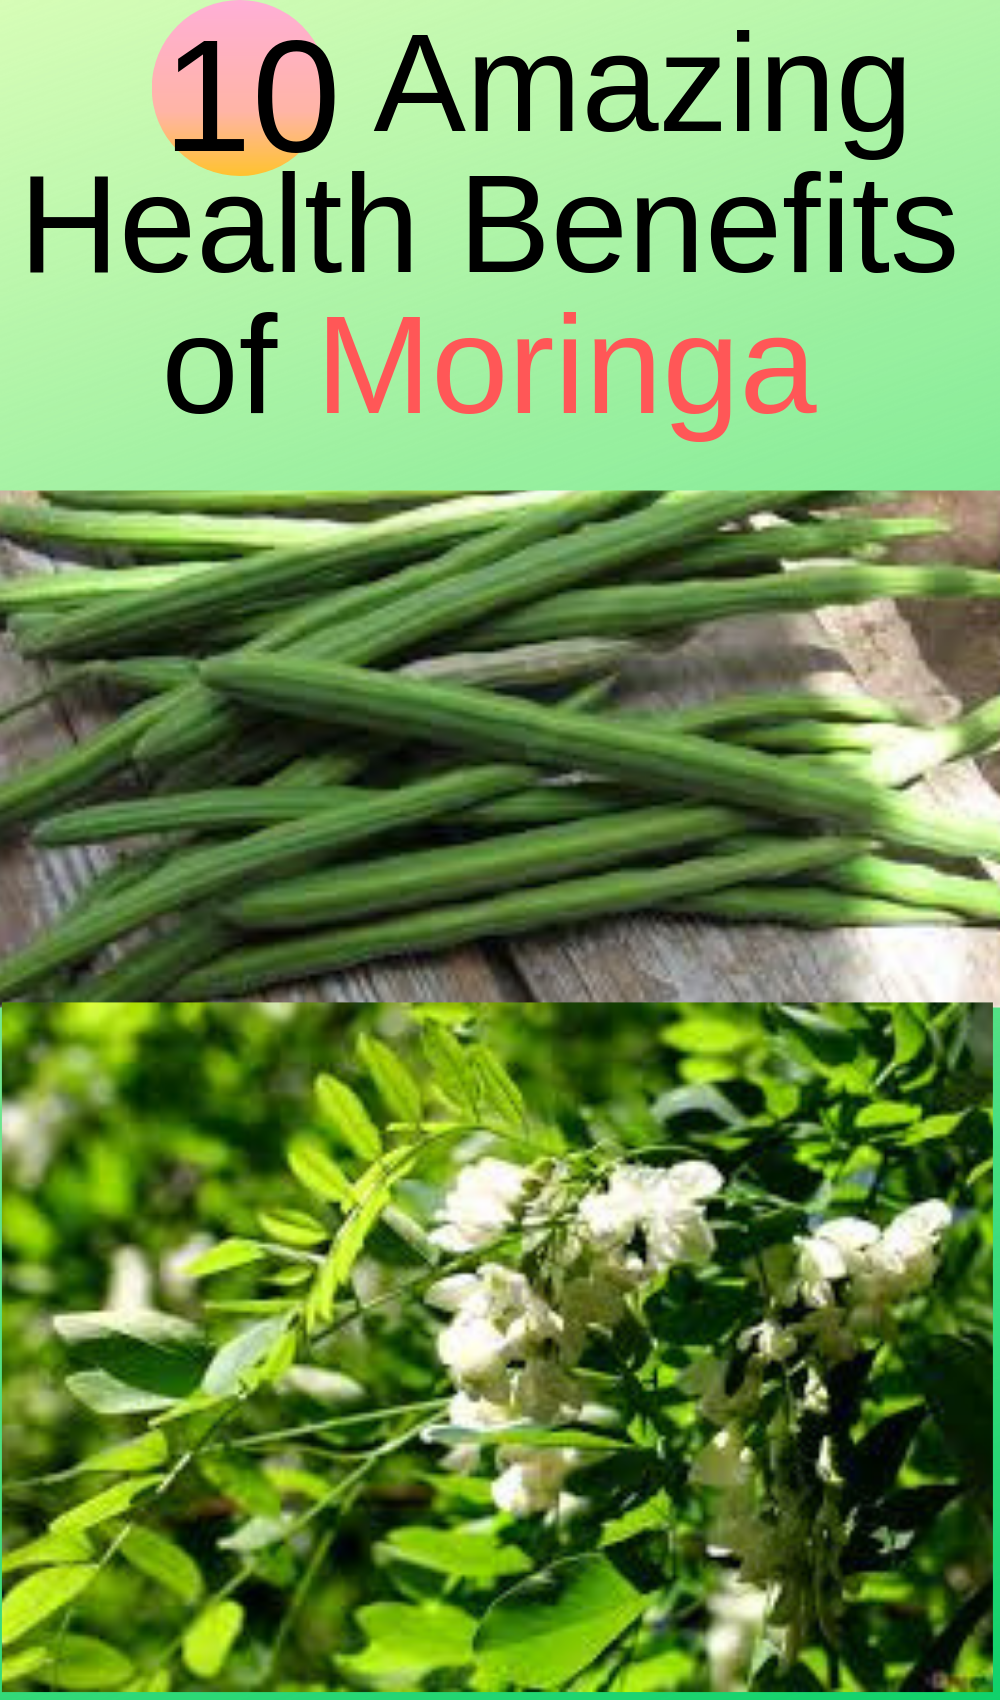 Health benefits of Moringa, Moringa health benefits, Moringa